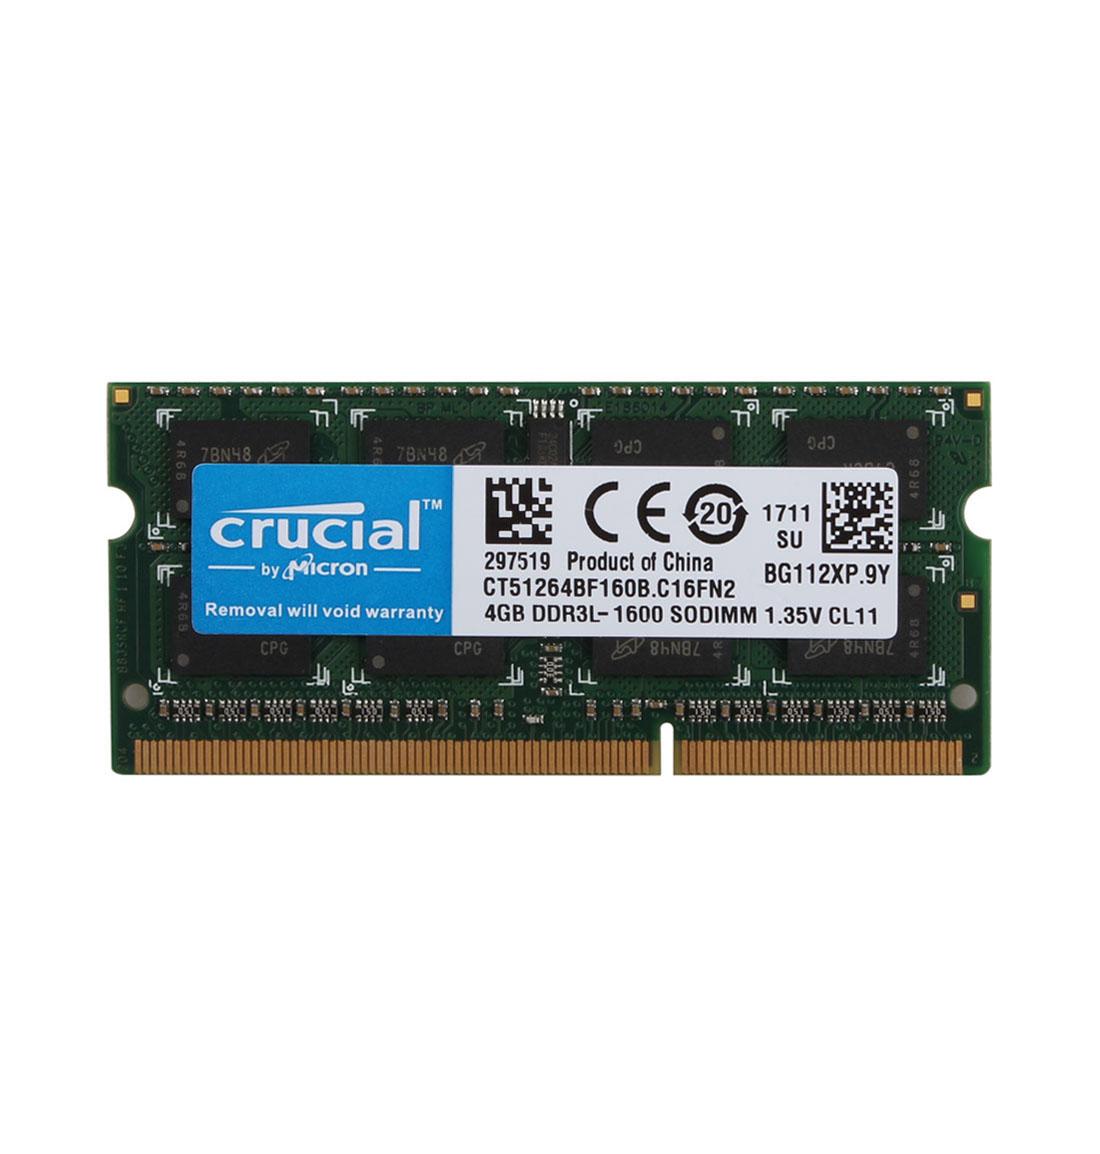 Crucial RAM 16G 8GB 4GB PC3L-12800 DDR3L 1600MHz Laptop Memory SODIMM 204pin Lot